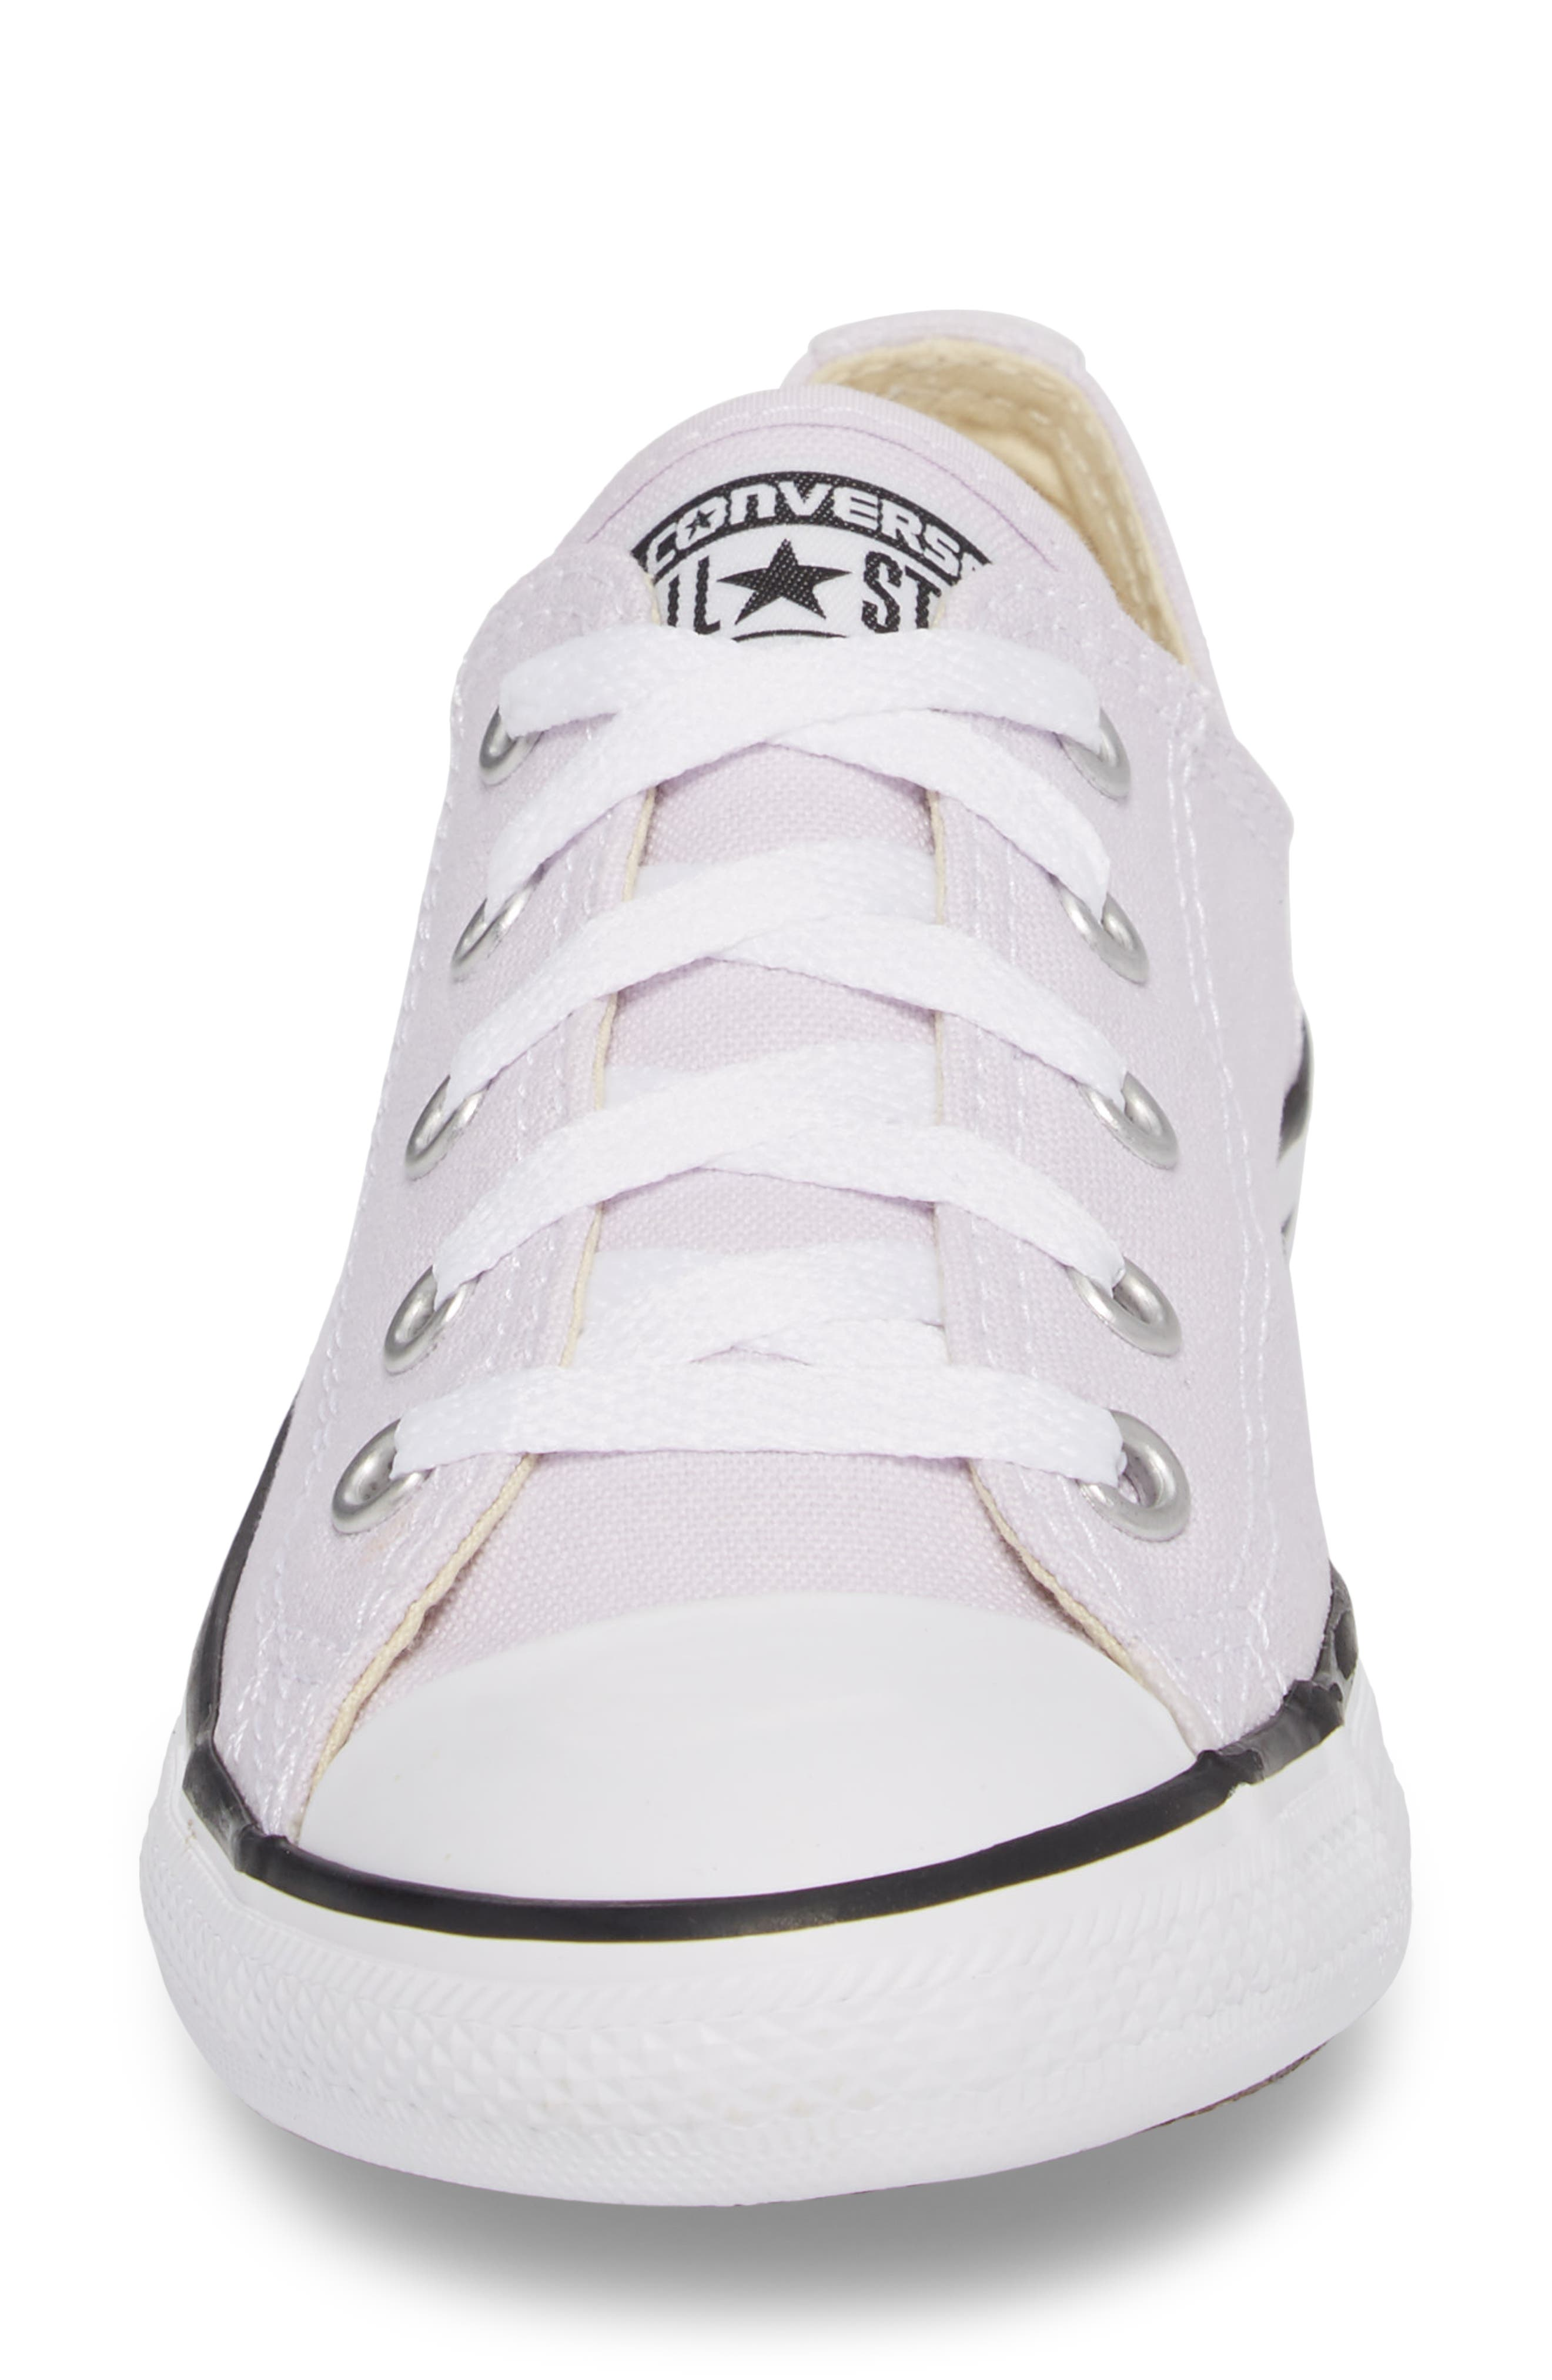 Alternate Image 4  - Converse Chuck Taylor® All Star® Dainty Ox Low Top Sneaker (Women)